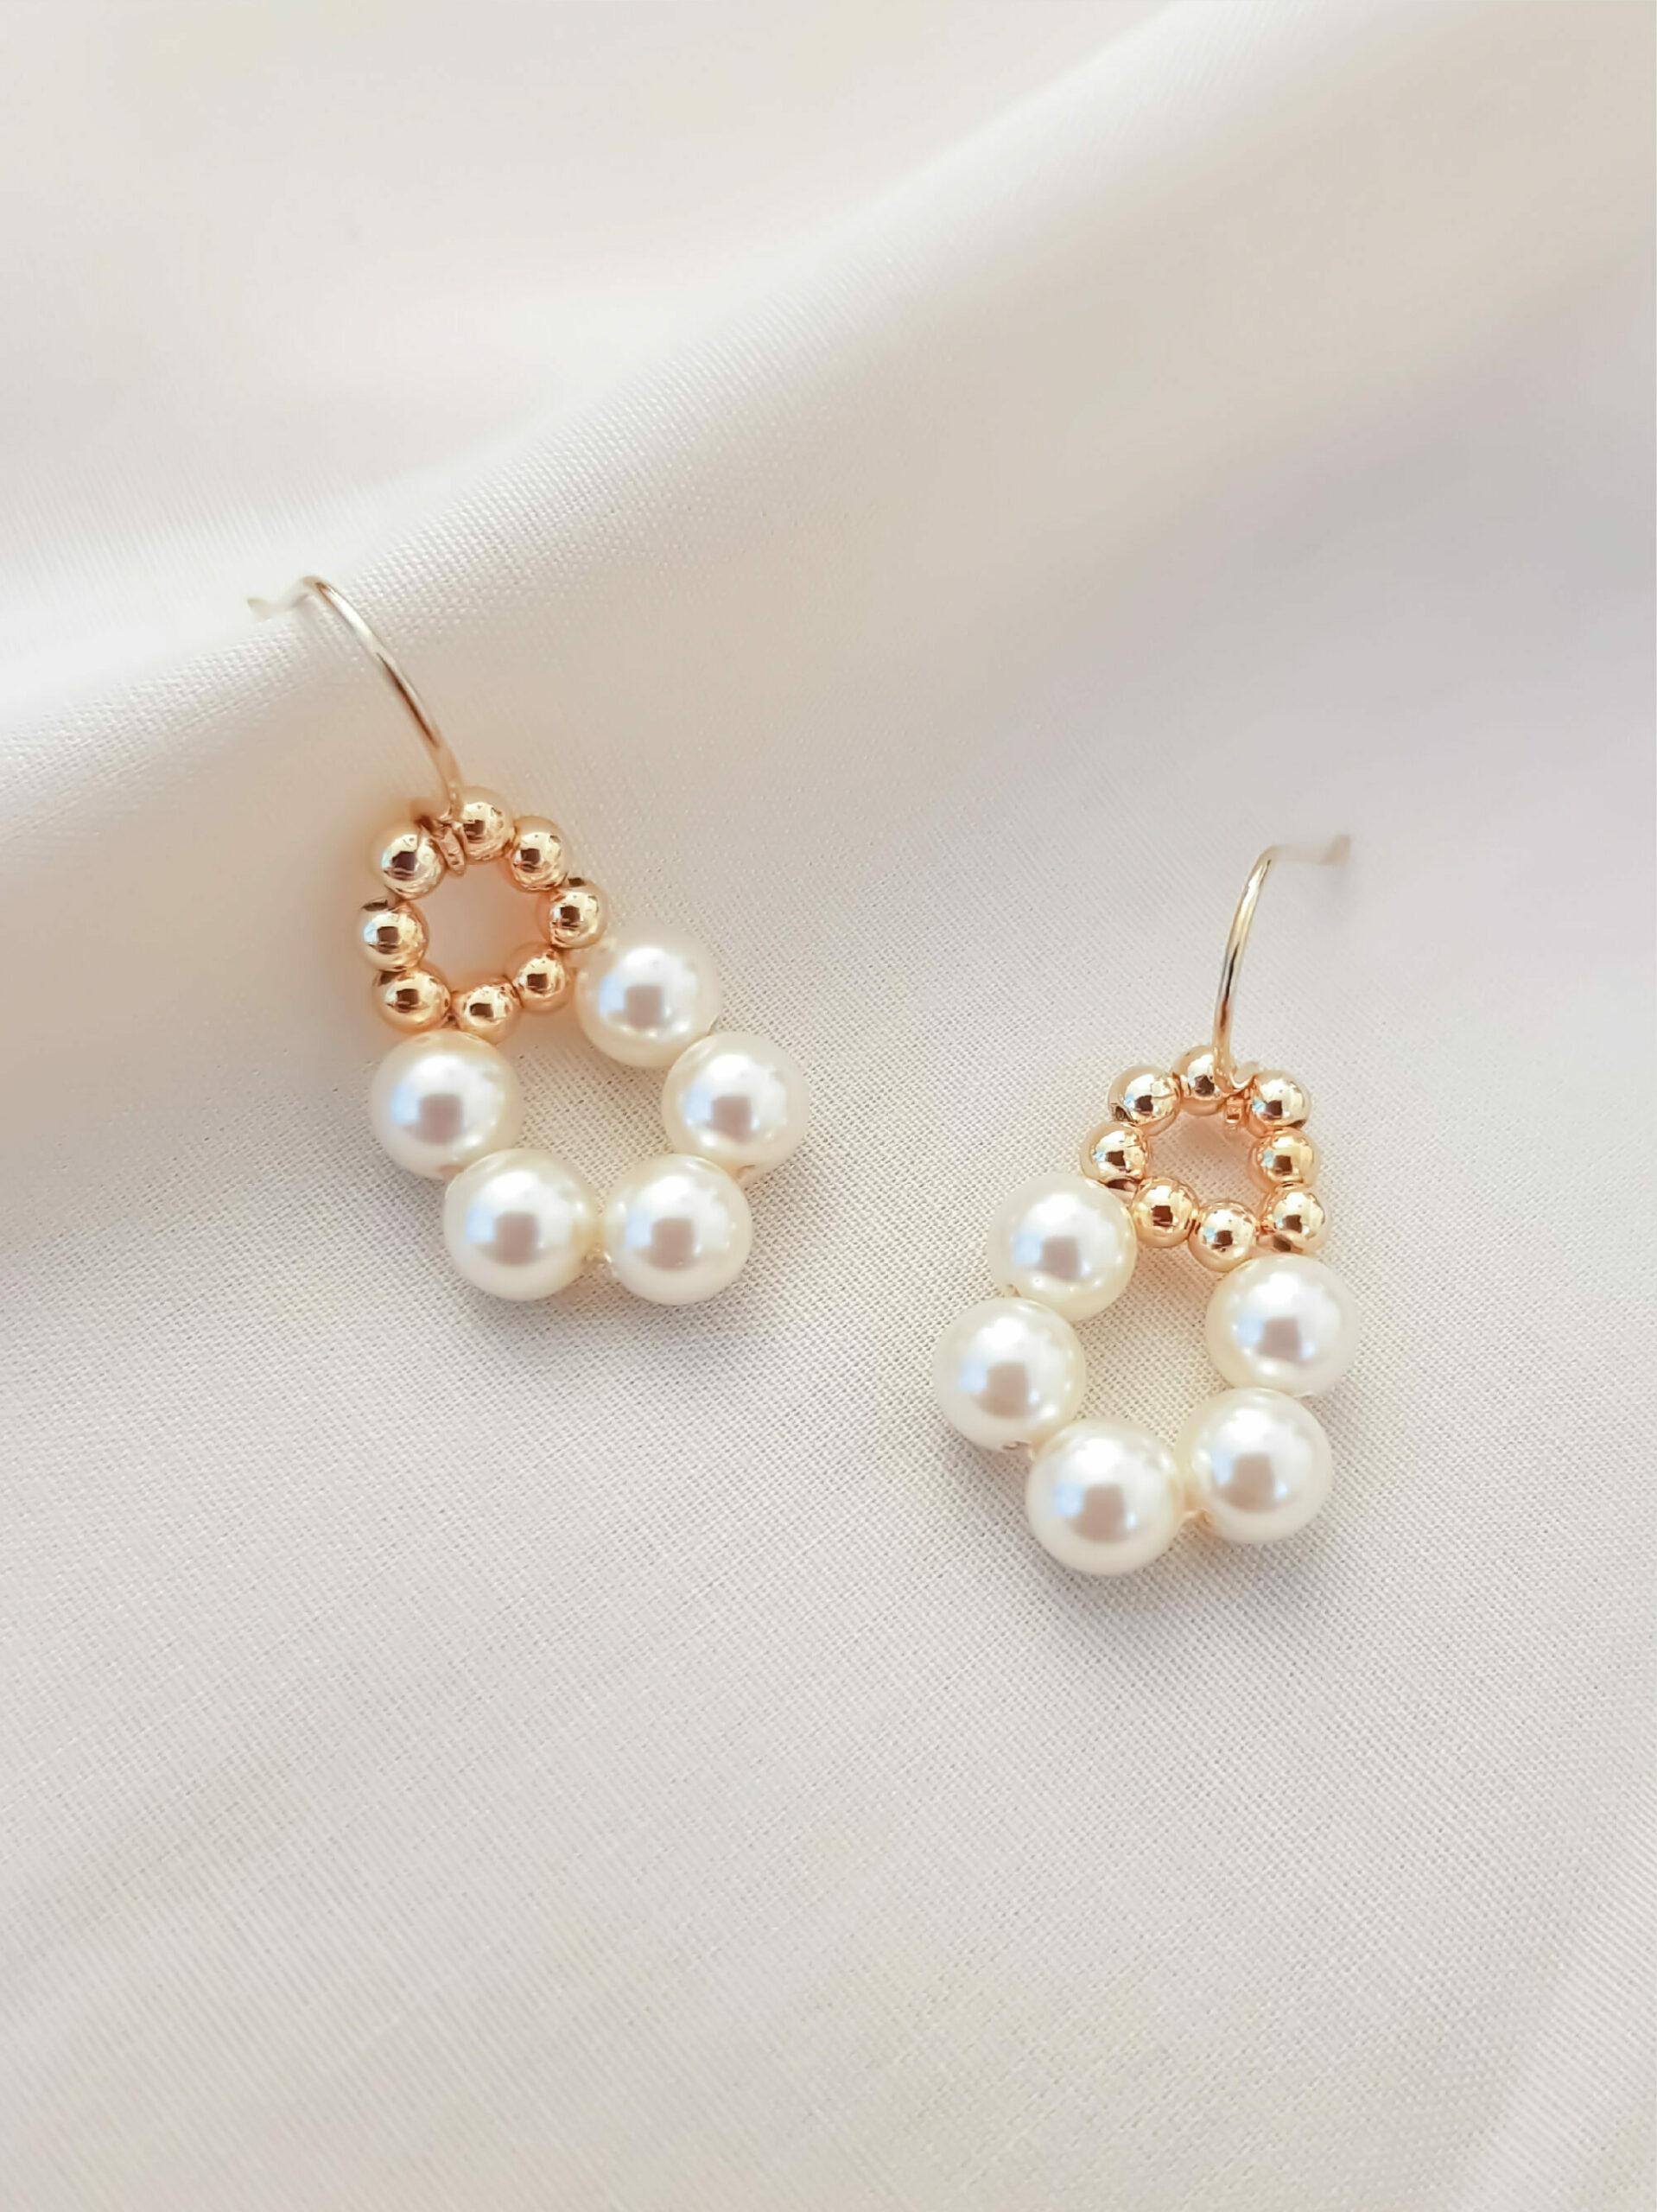 JeannieRichard Parfaite Pearl Earrings